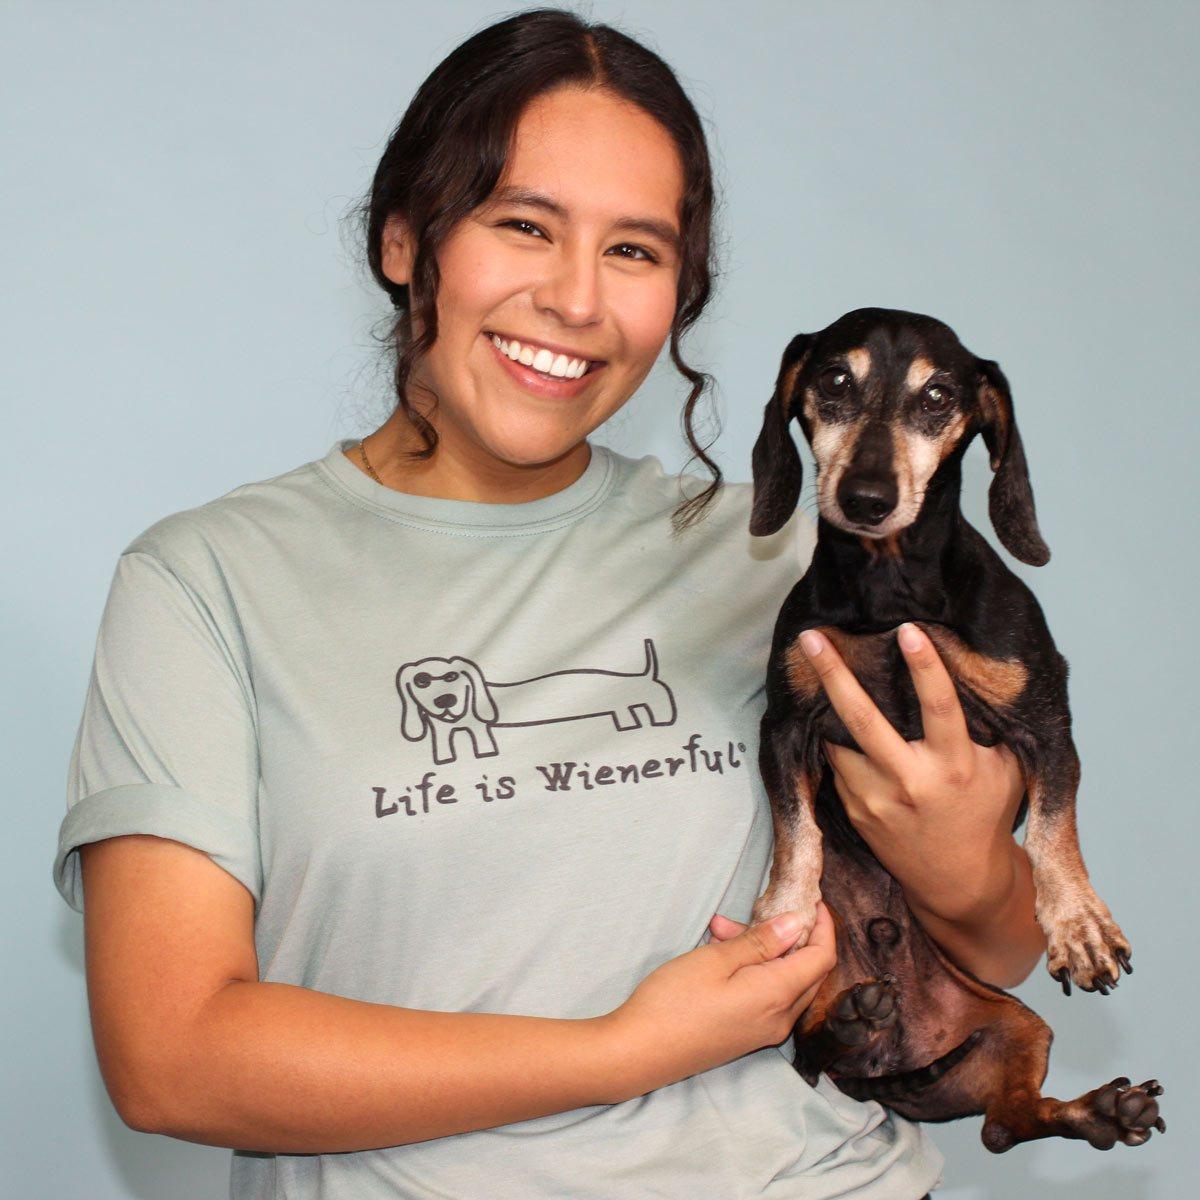 woman wearing custom tee shirt holding a dog